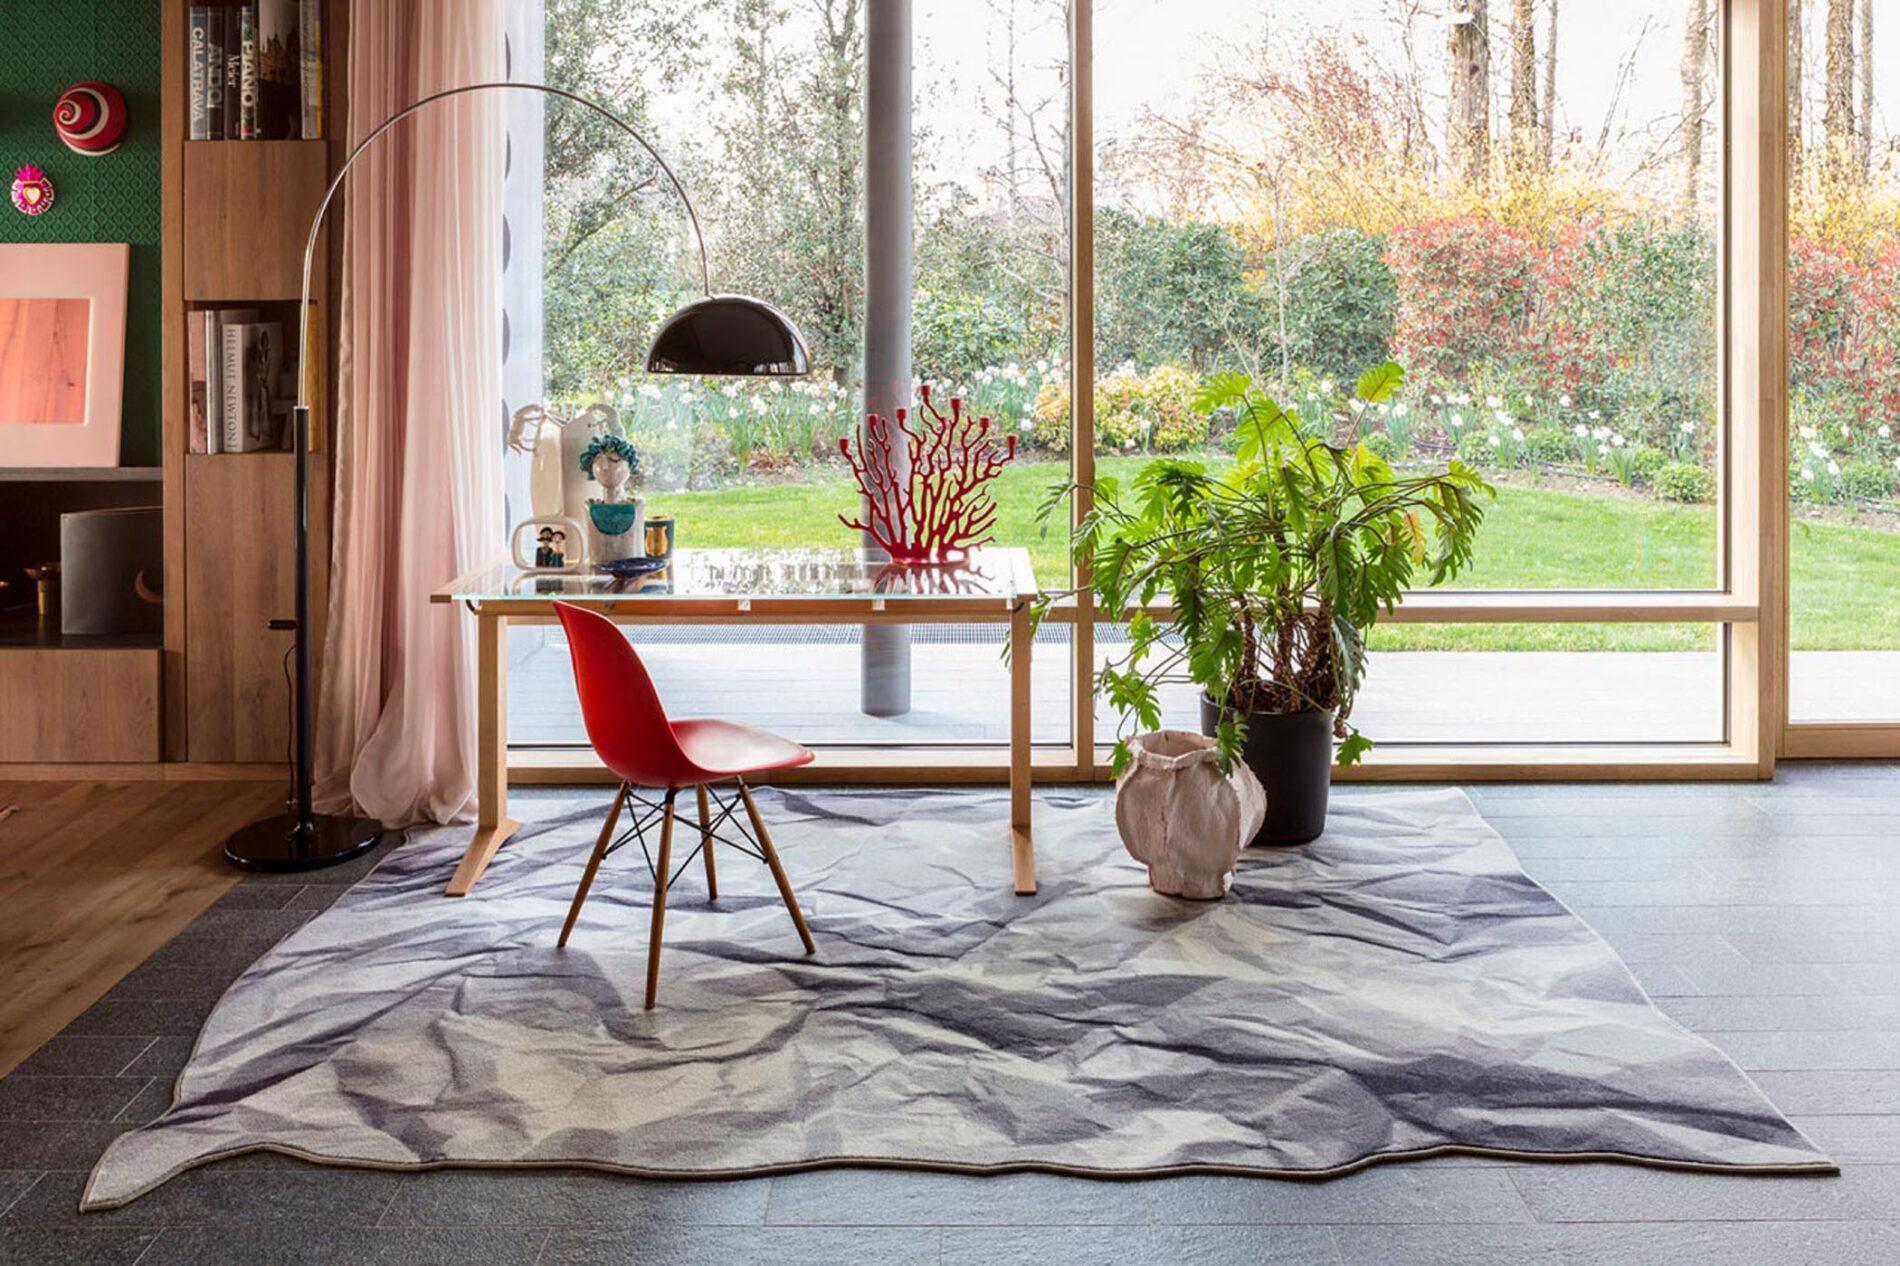 mogg rugs neversaid header 1280x853 1 - Progetti